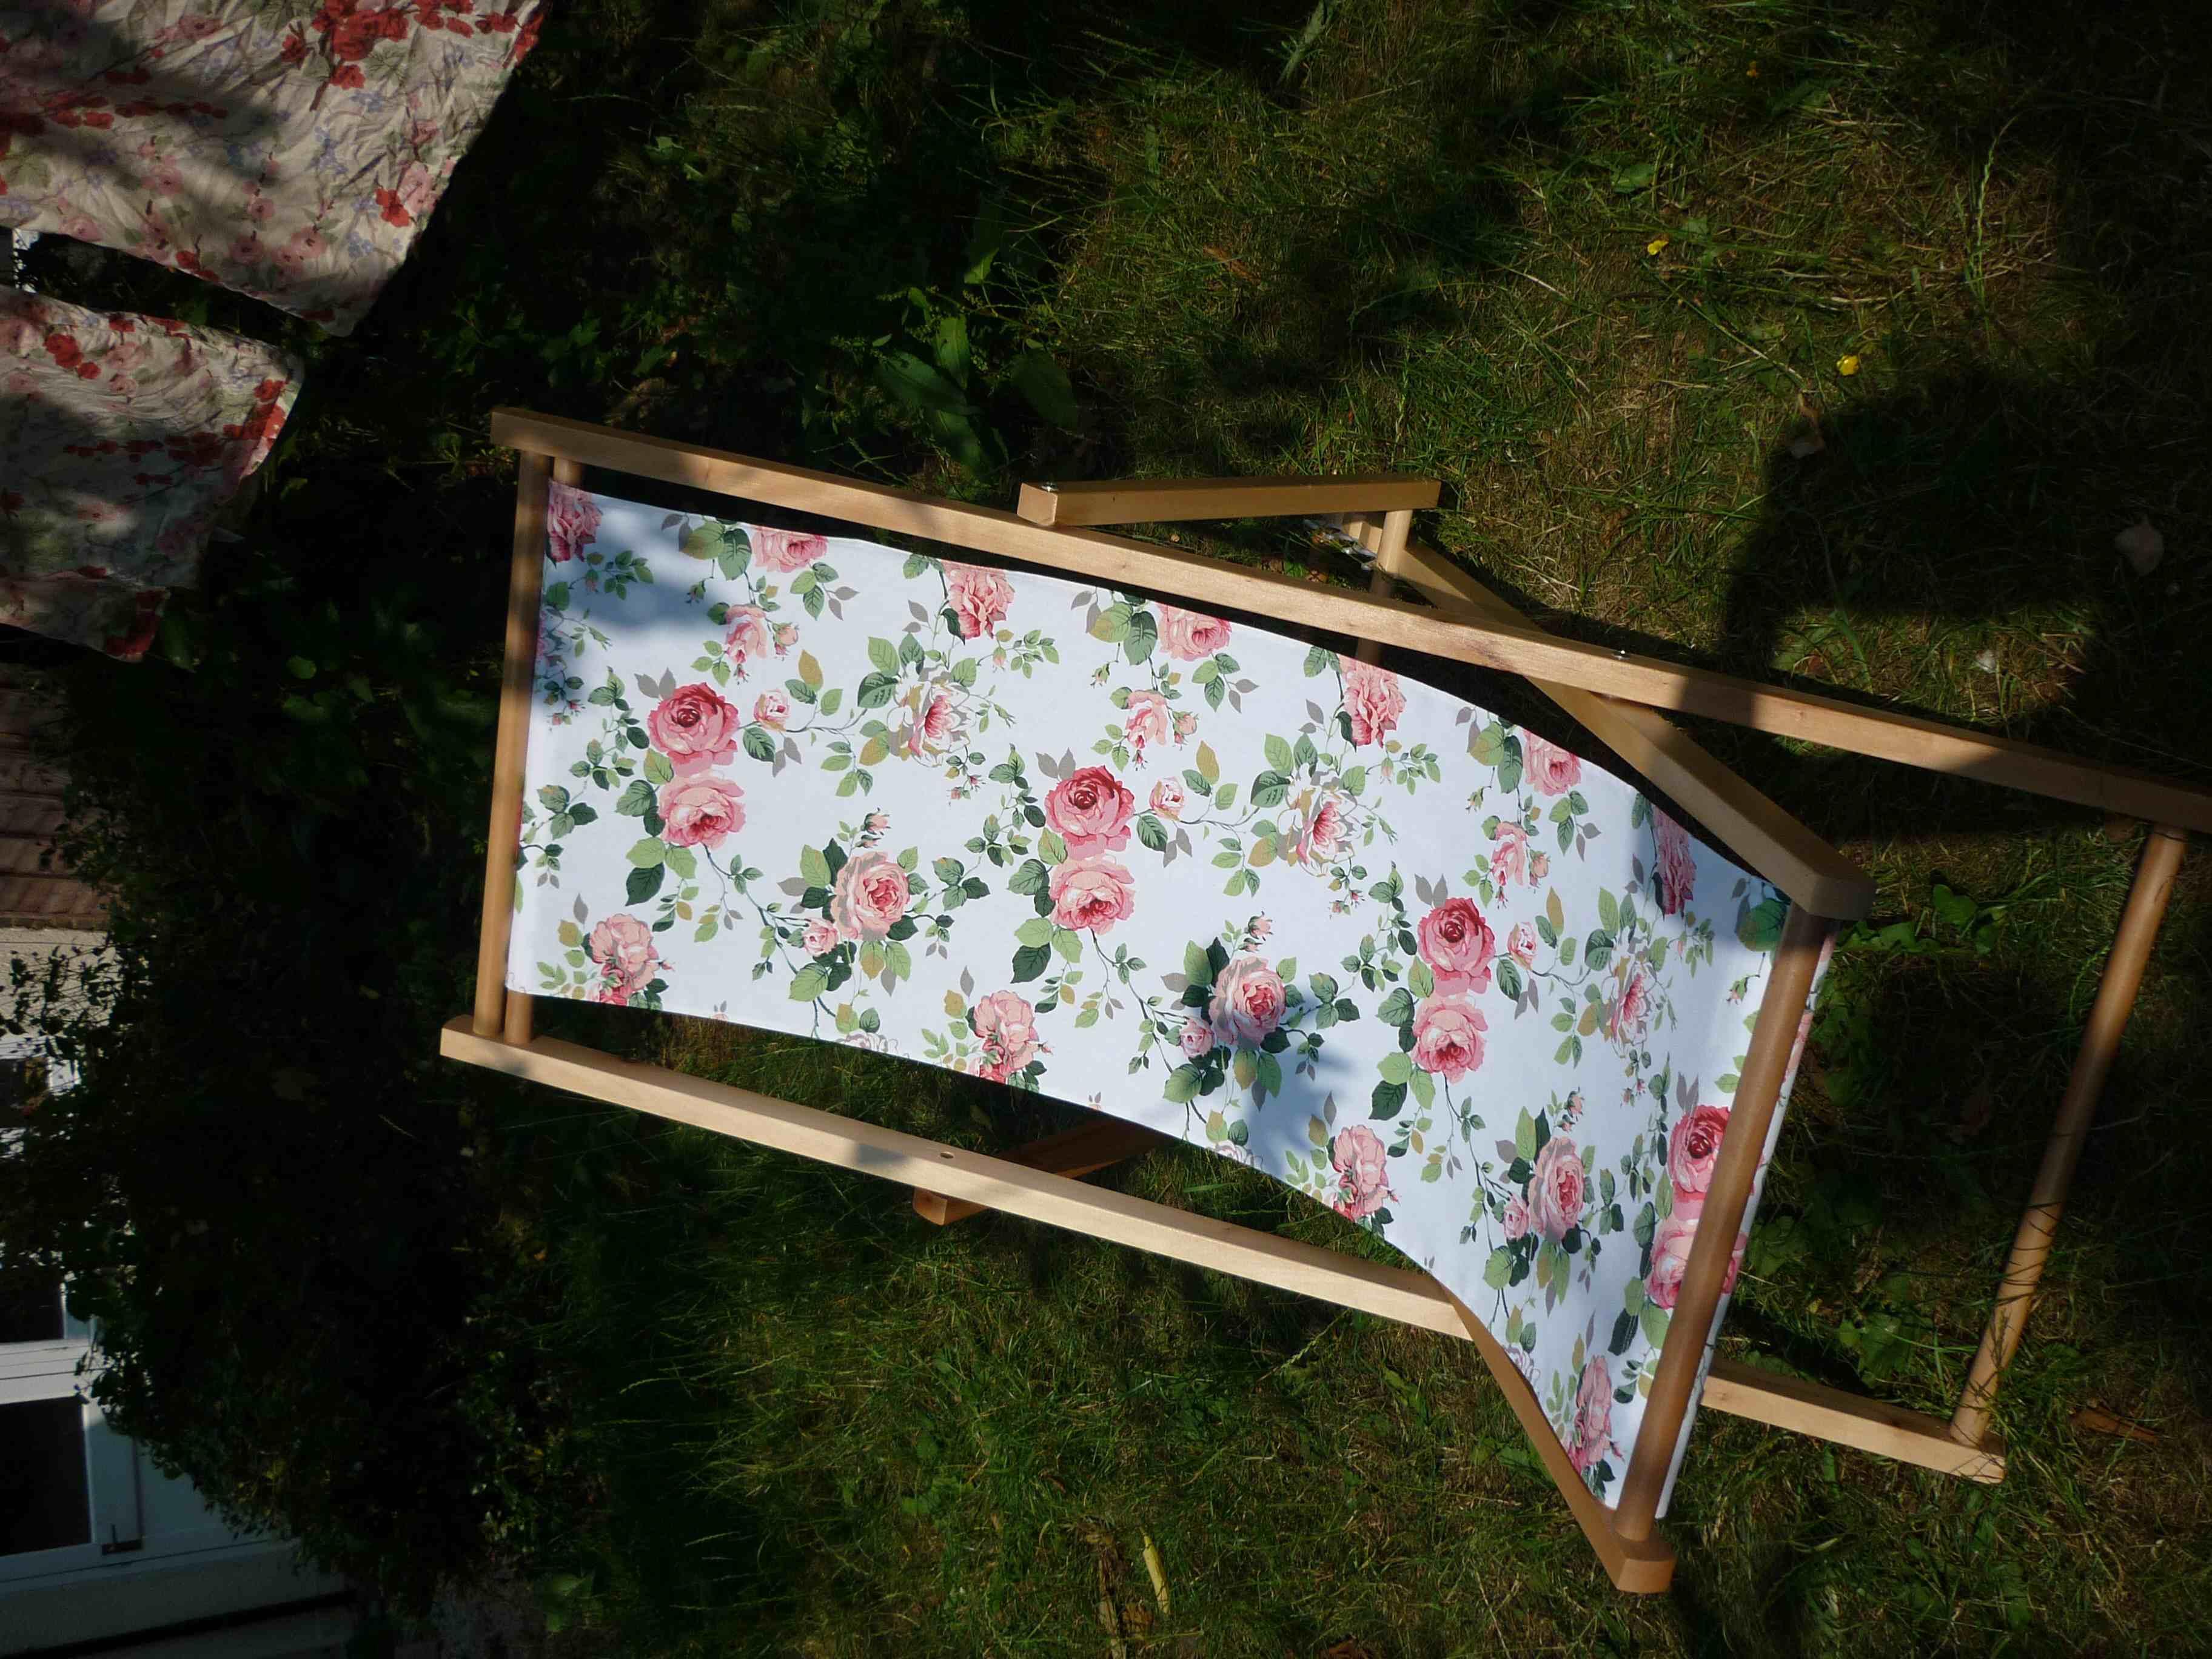 Charmant Floral Deck Chair